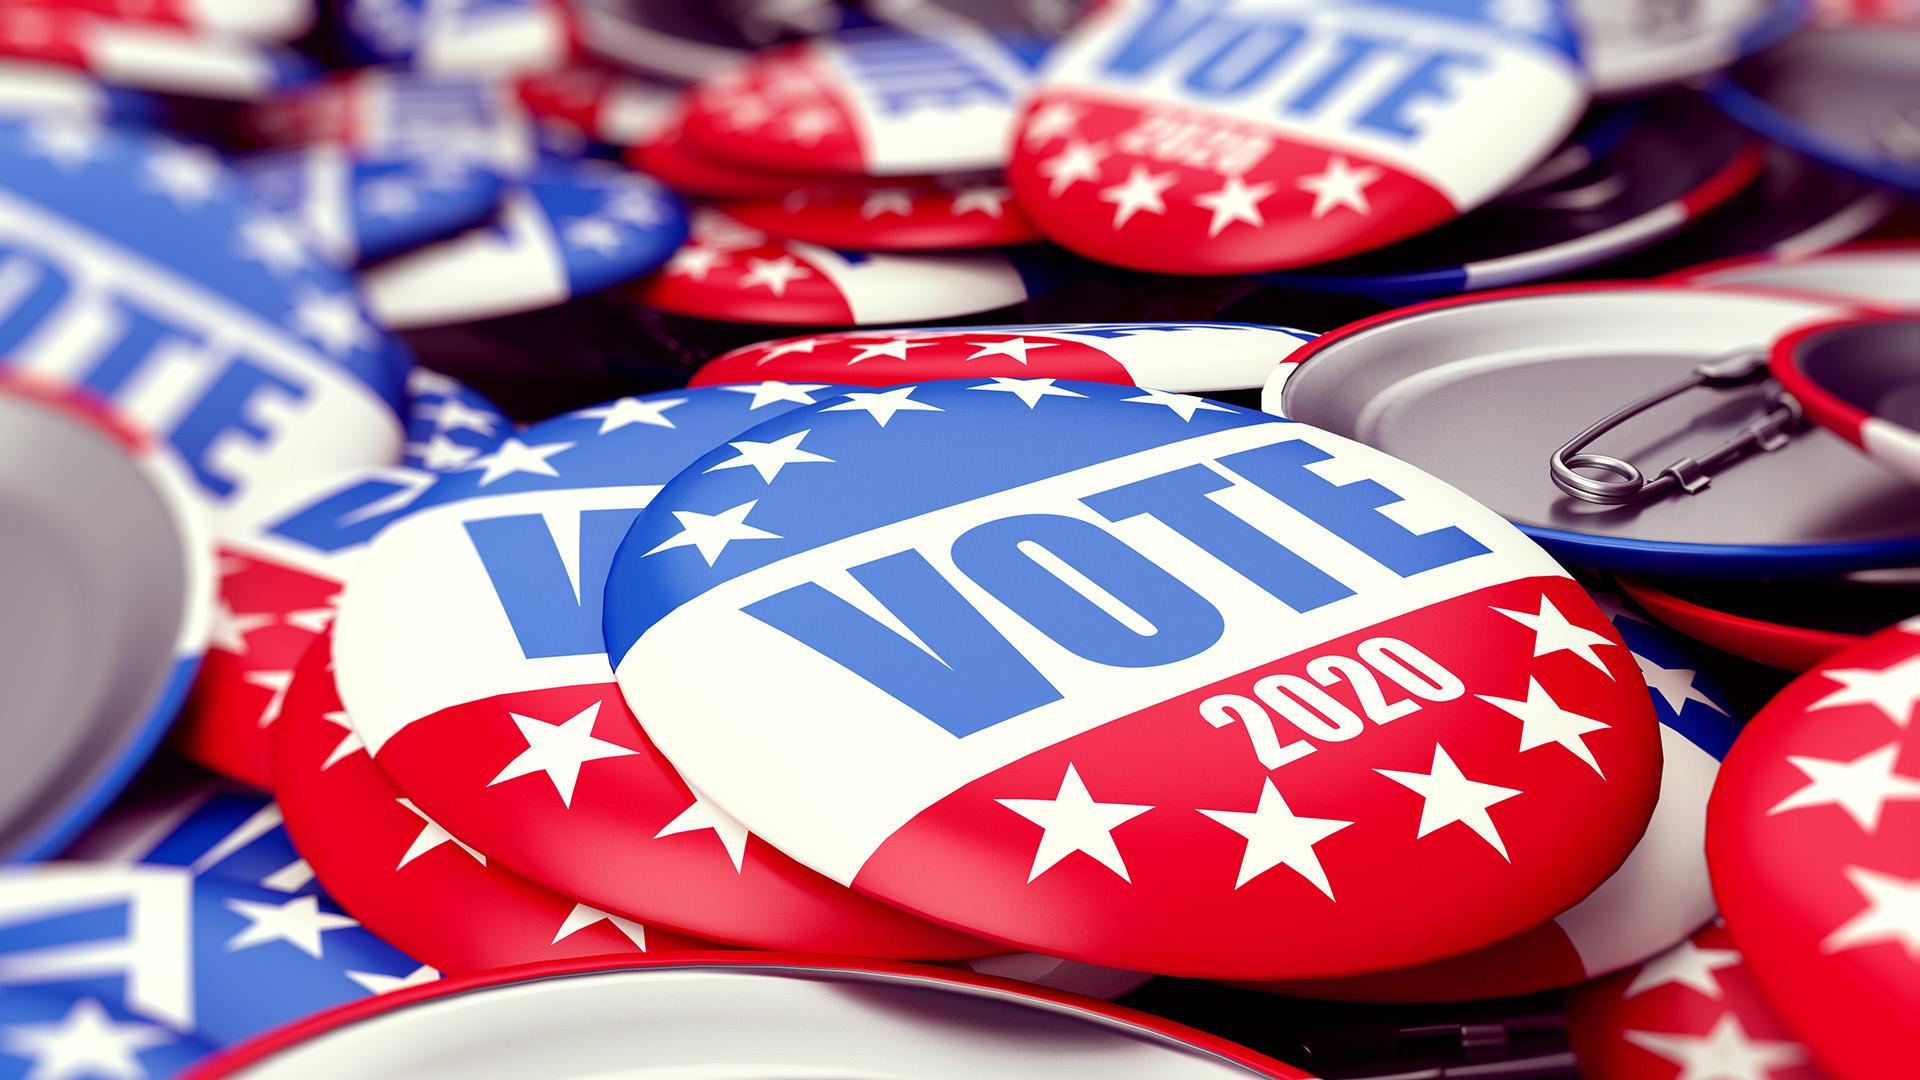 20kw45_US-Wahlen_229628517